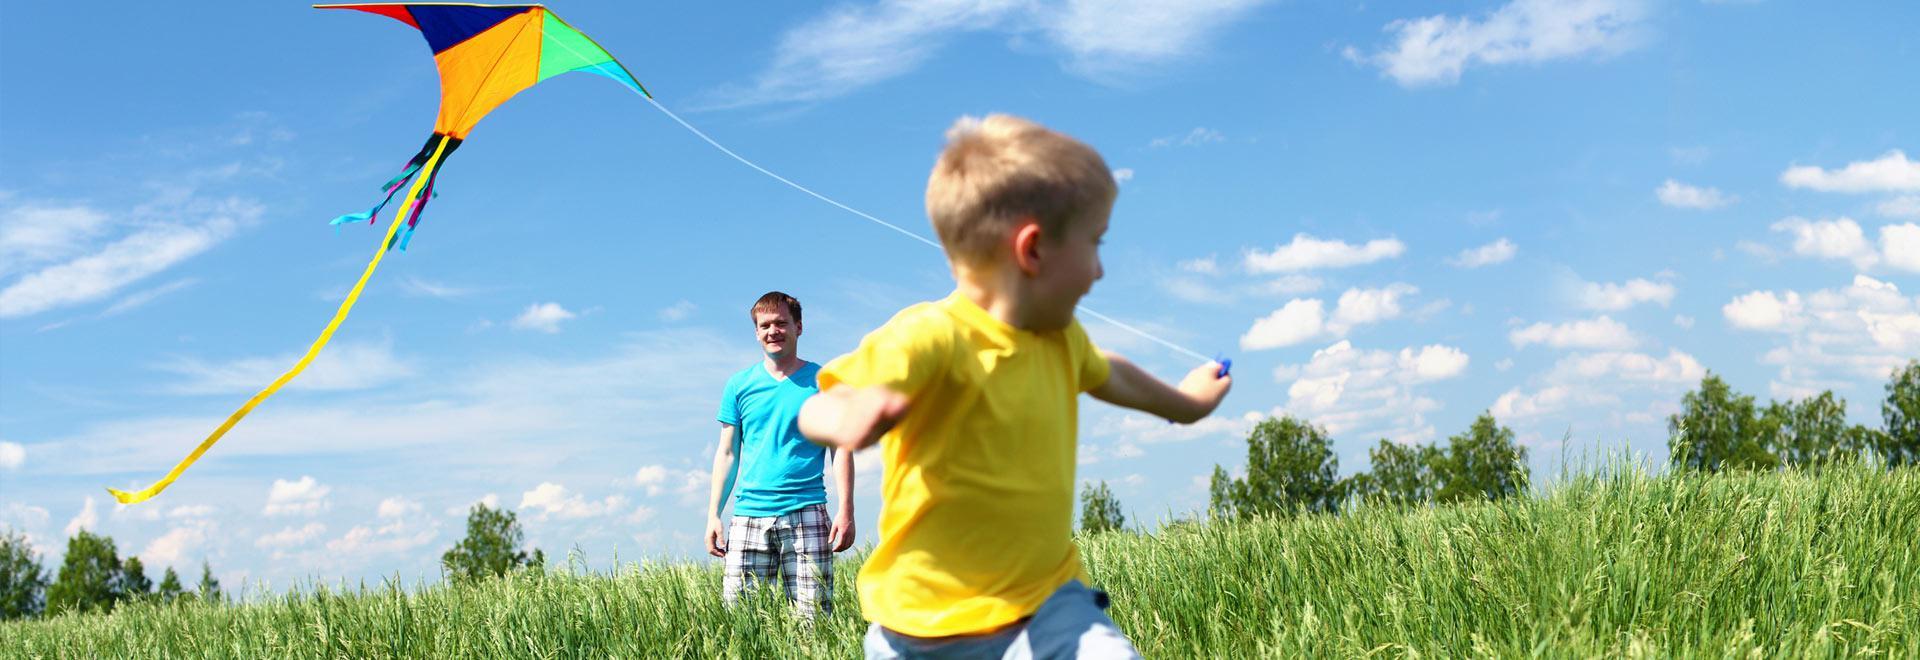 Dziecko z latawcem - element slidera